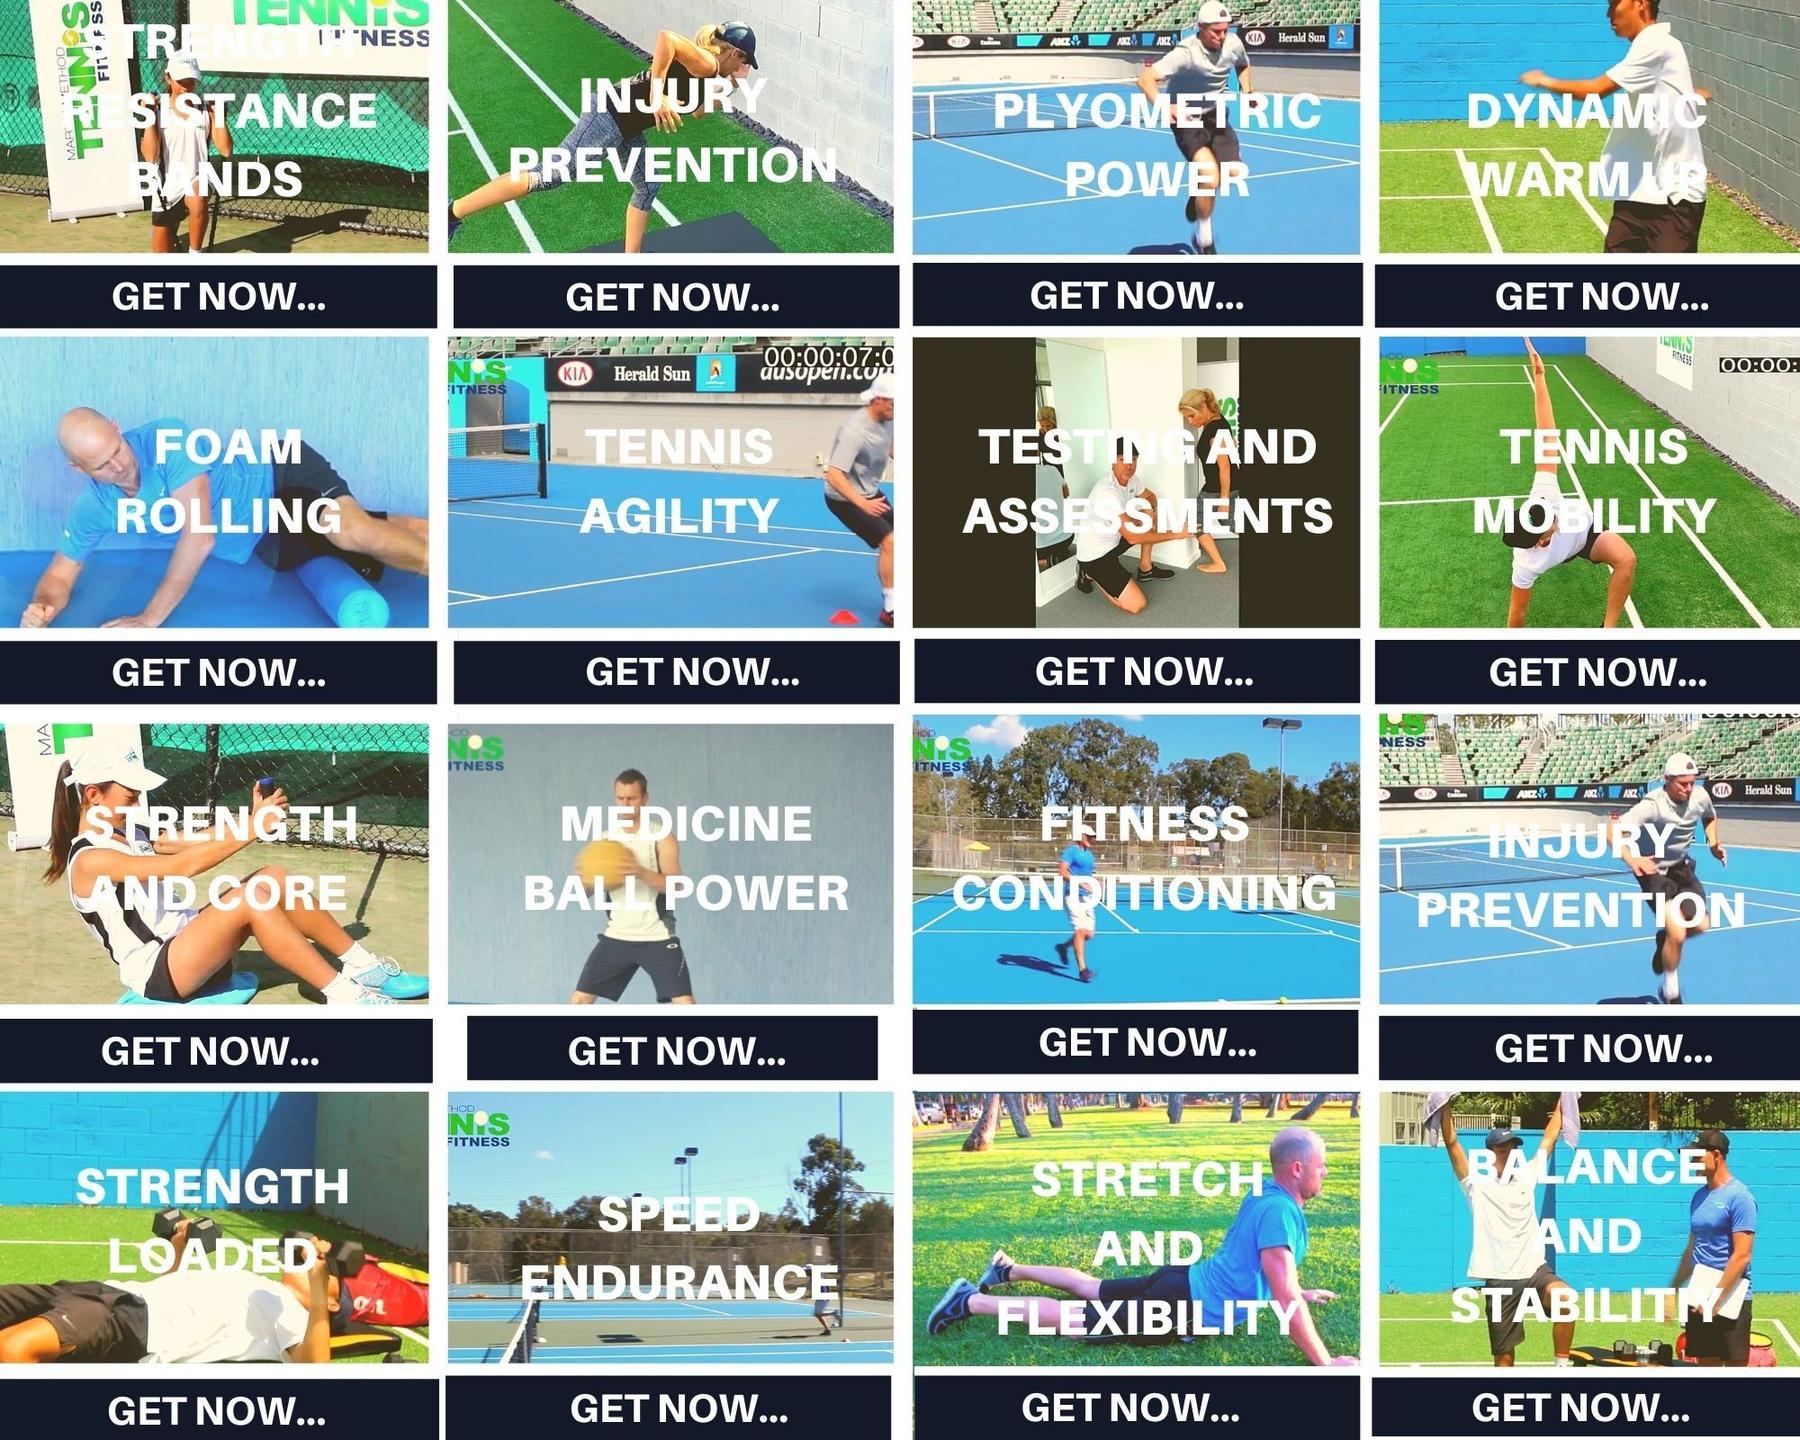 image of junior tennis programs